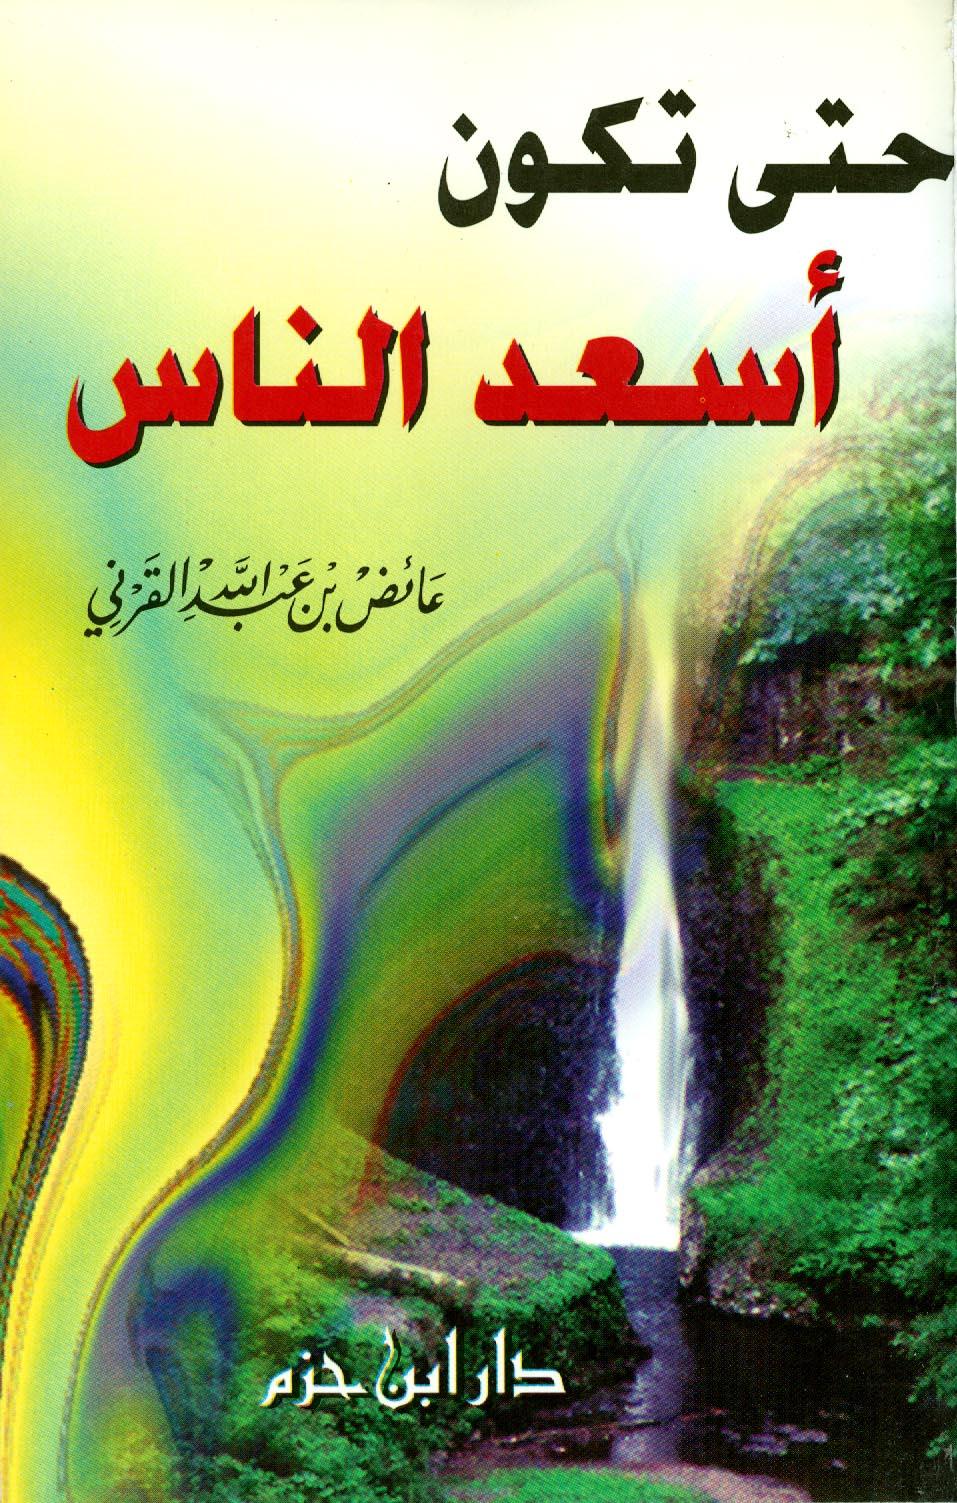 Photo of تحميل كتاب حتى تكون أسعد الناس pdf لـ عائض القرني